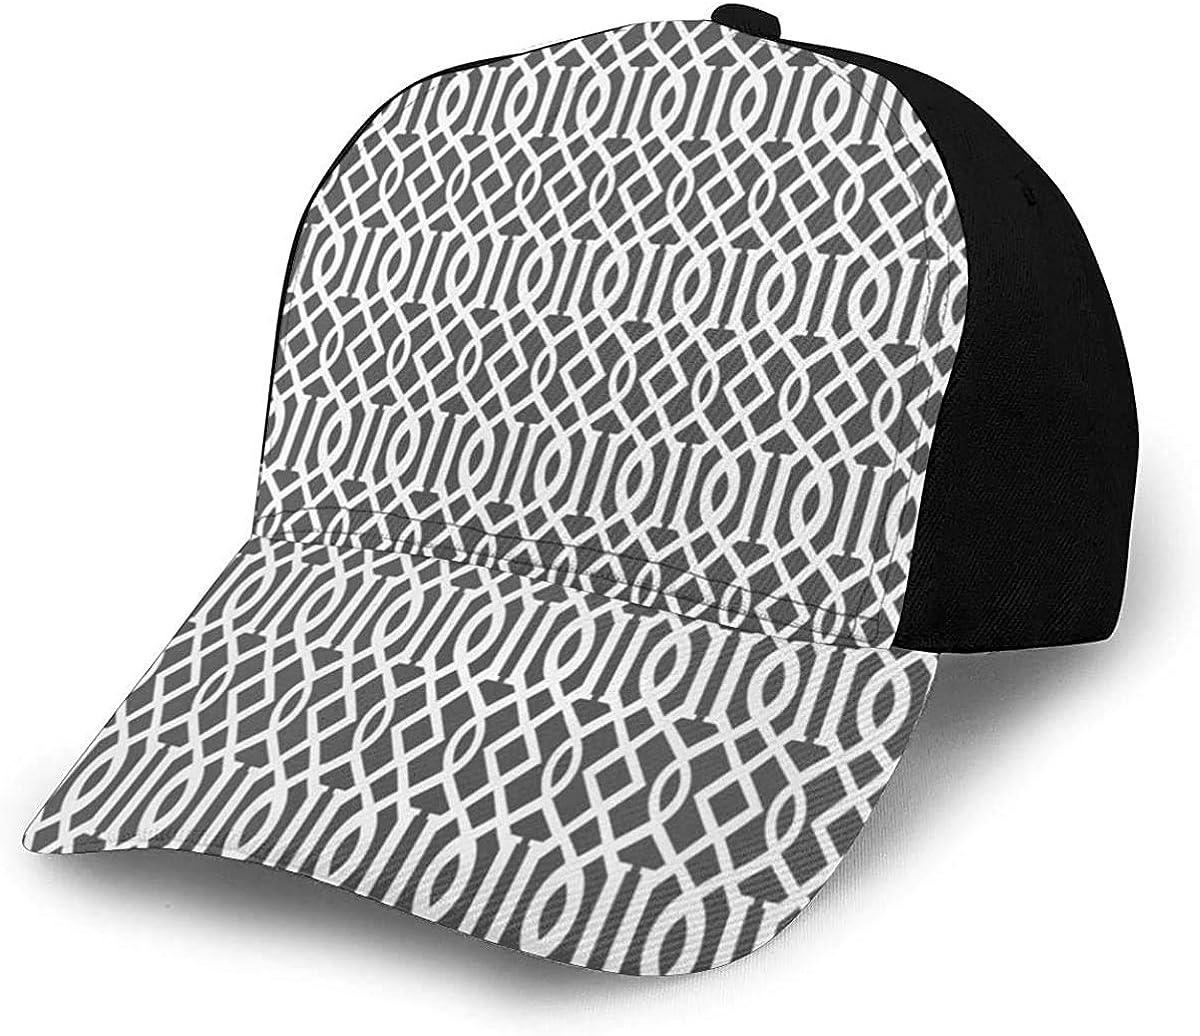 White Imperial Trellis Lightweight Unisex Baseball Caps Adjustable Breathable Sun Hat for Sport Outdoor